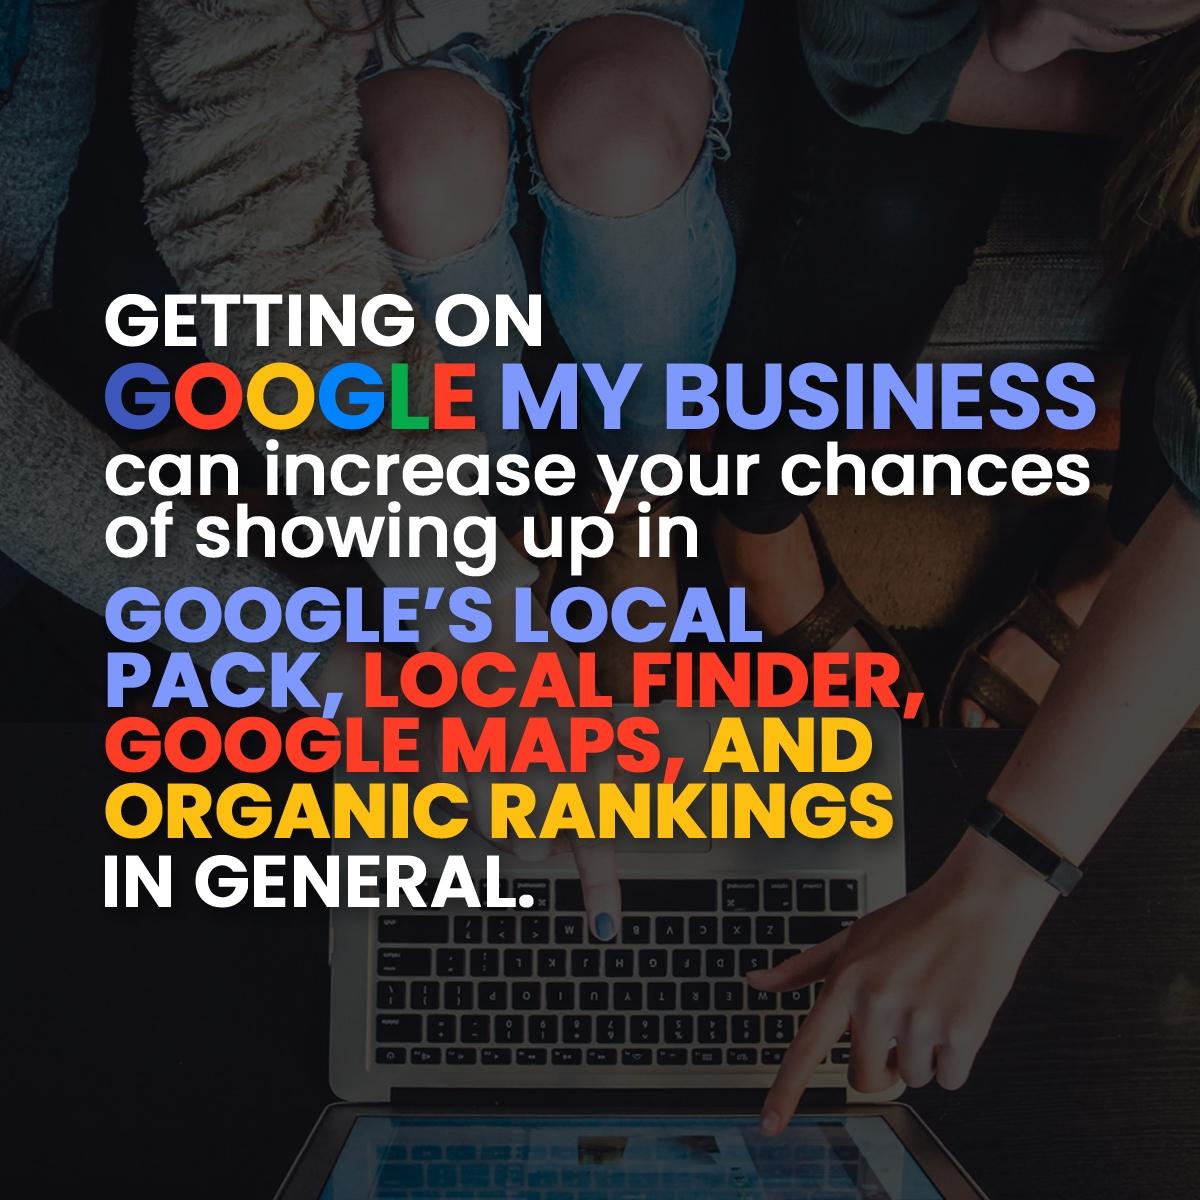 LeAva_Digital_Marketing_Agency_image_60